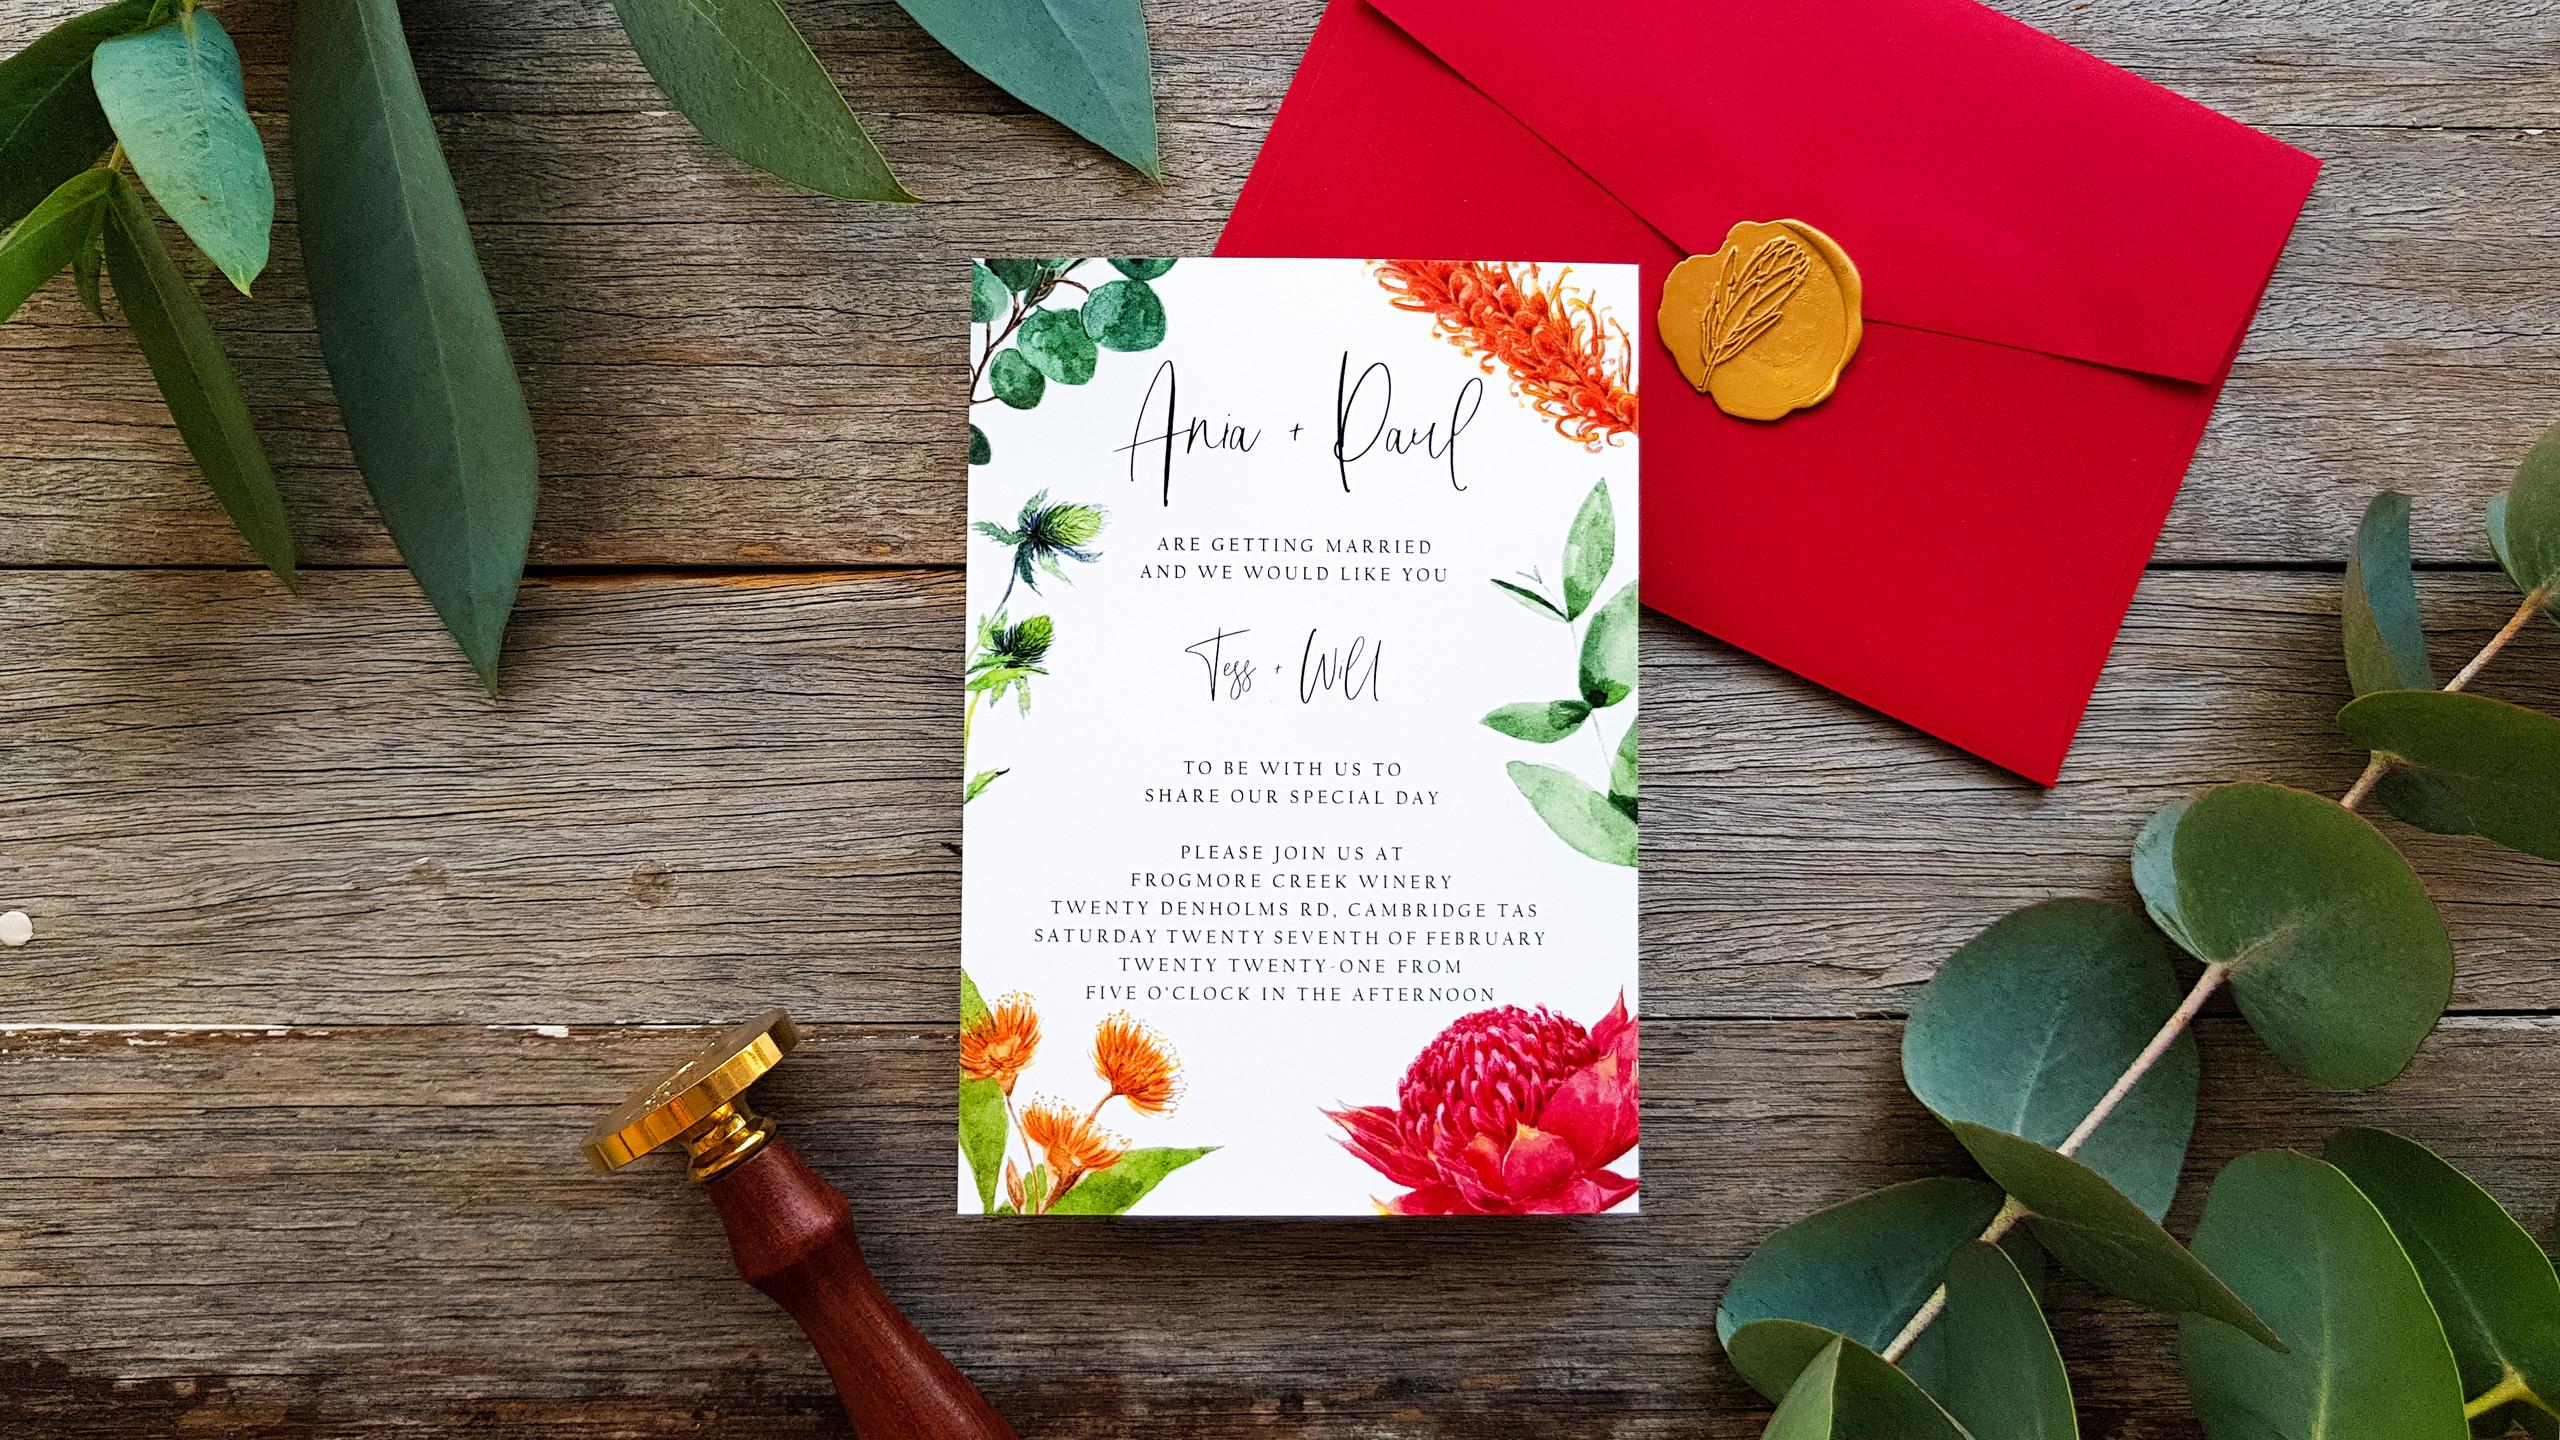 Tasmanian Wedding Invitation featuring custom watercolour artwork with Australian Flora